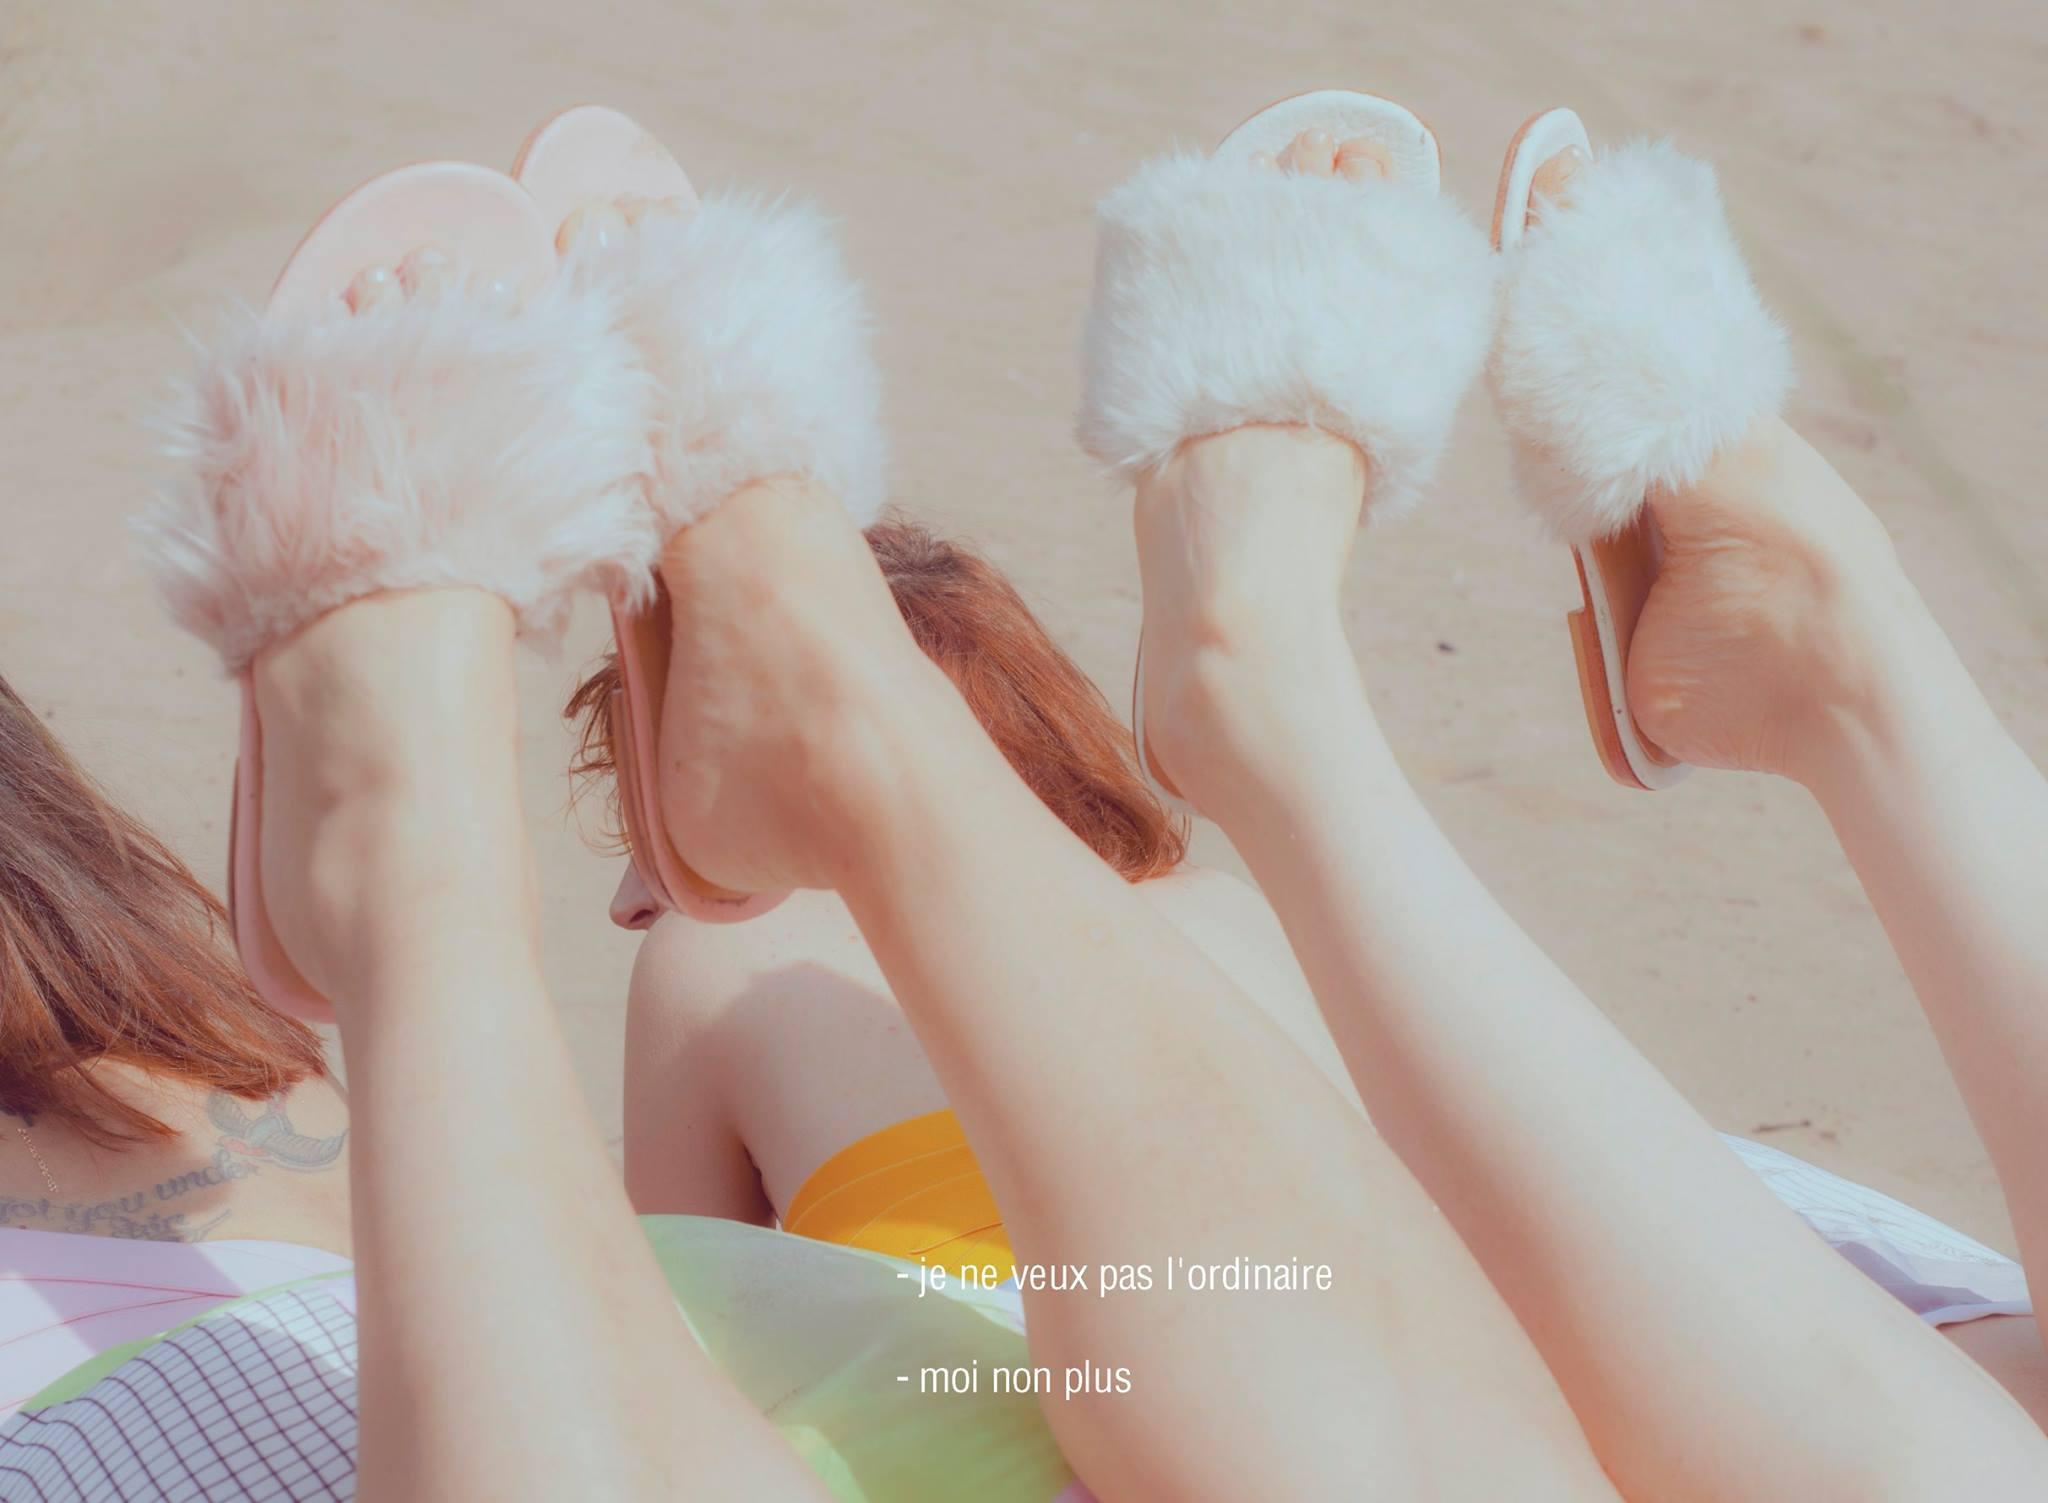 Shoe Room Meet: FUL MUN